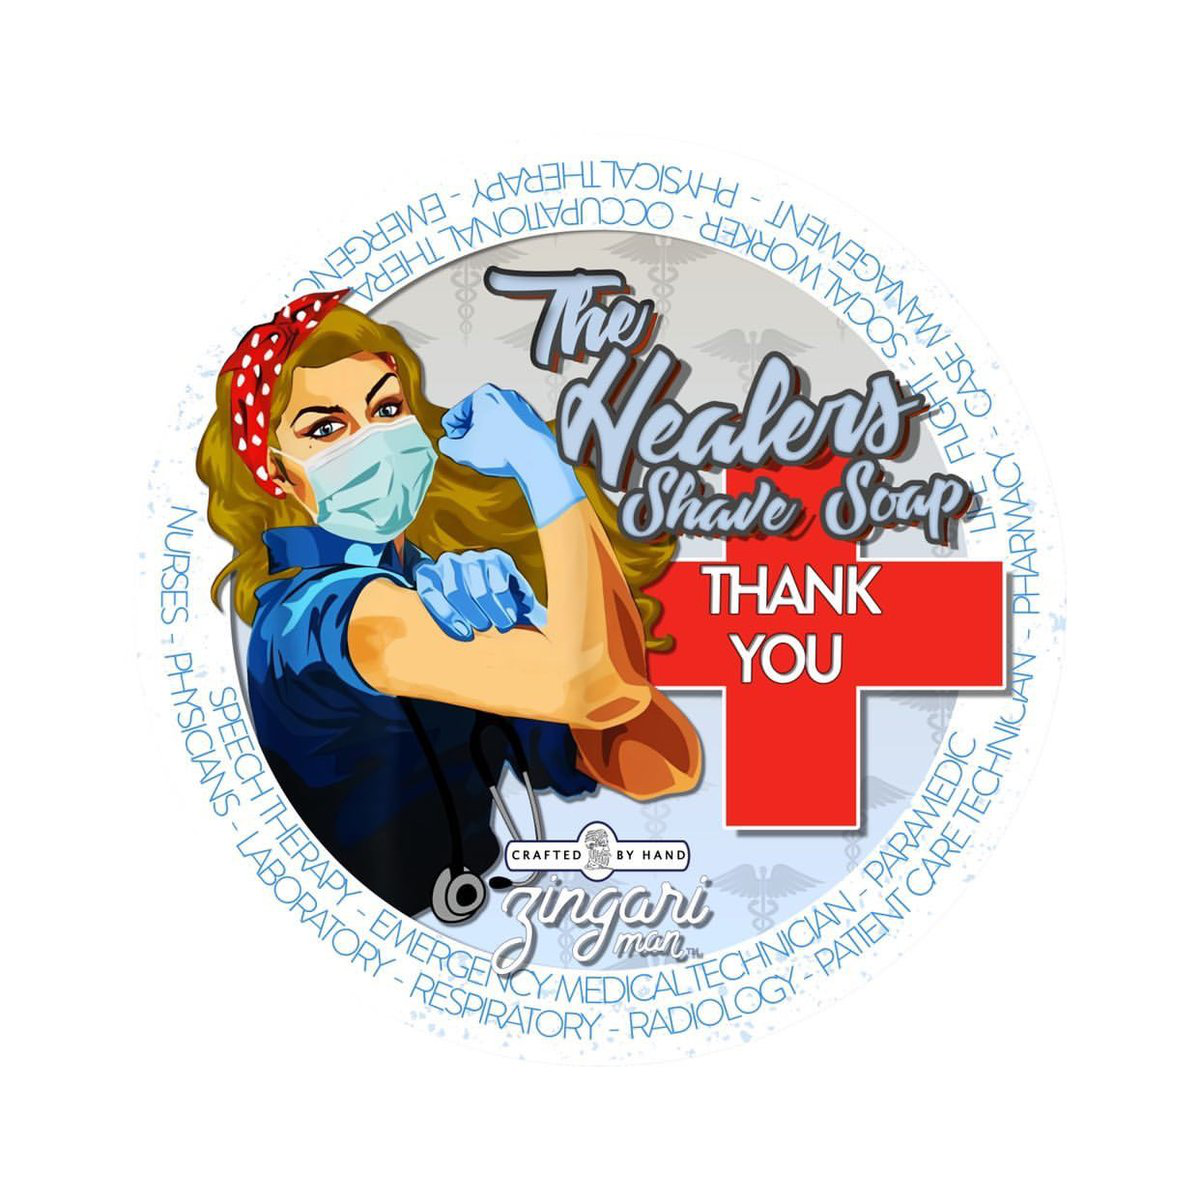 Zingari - The Healers - Soap image